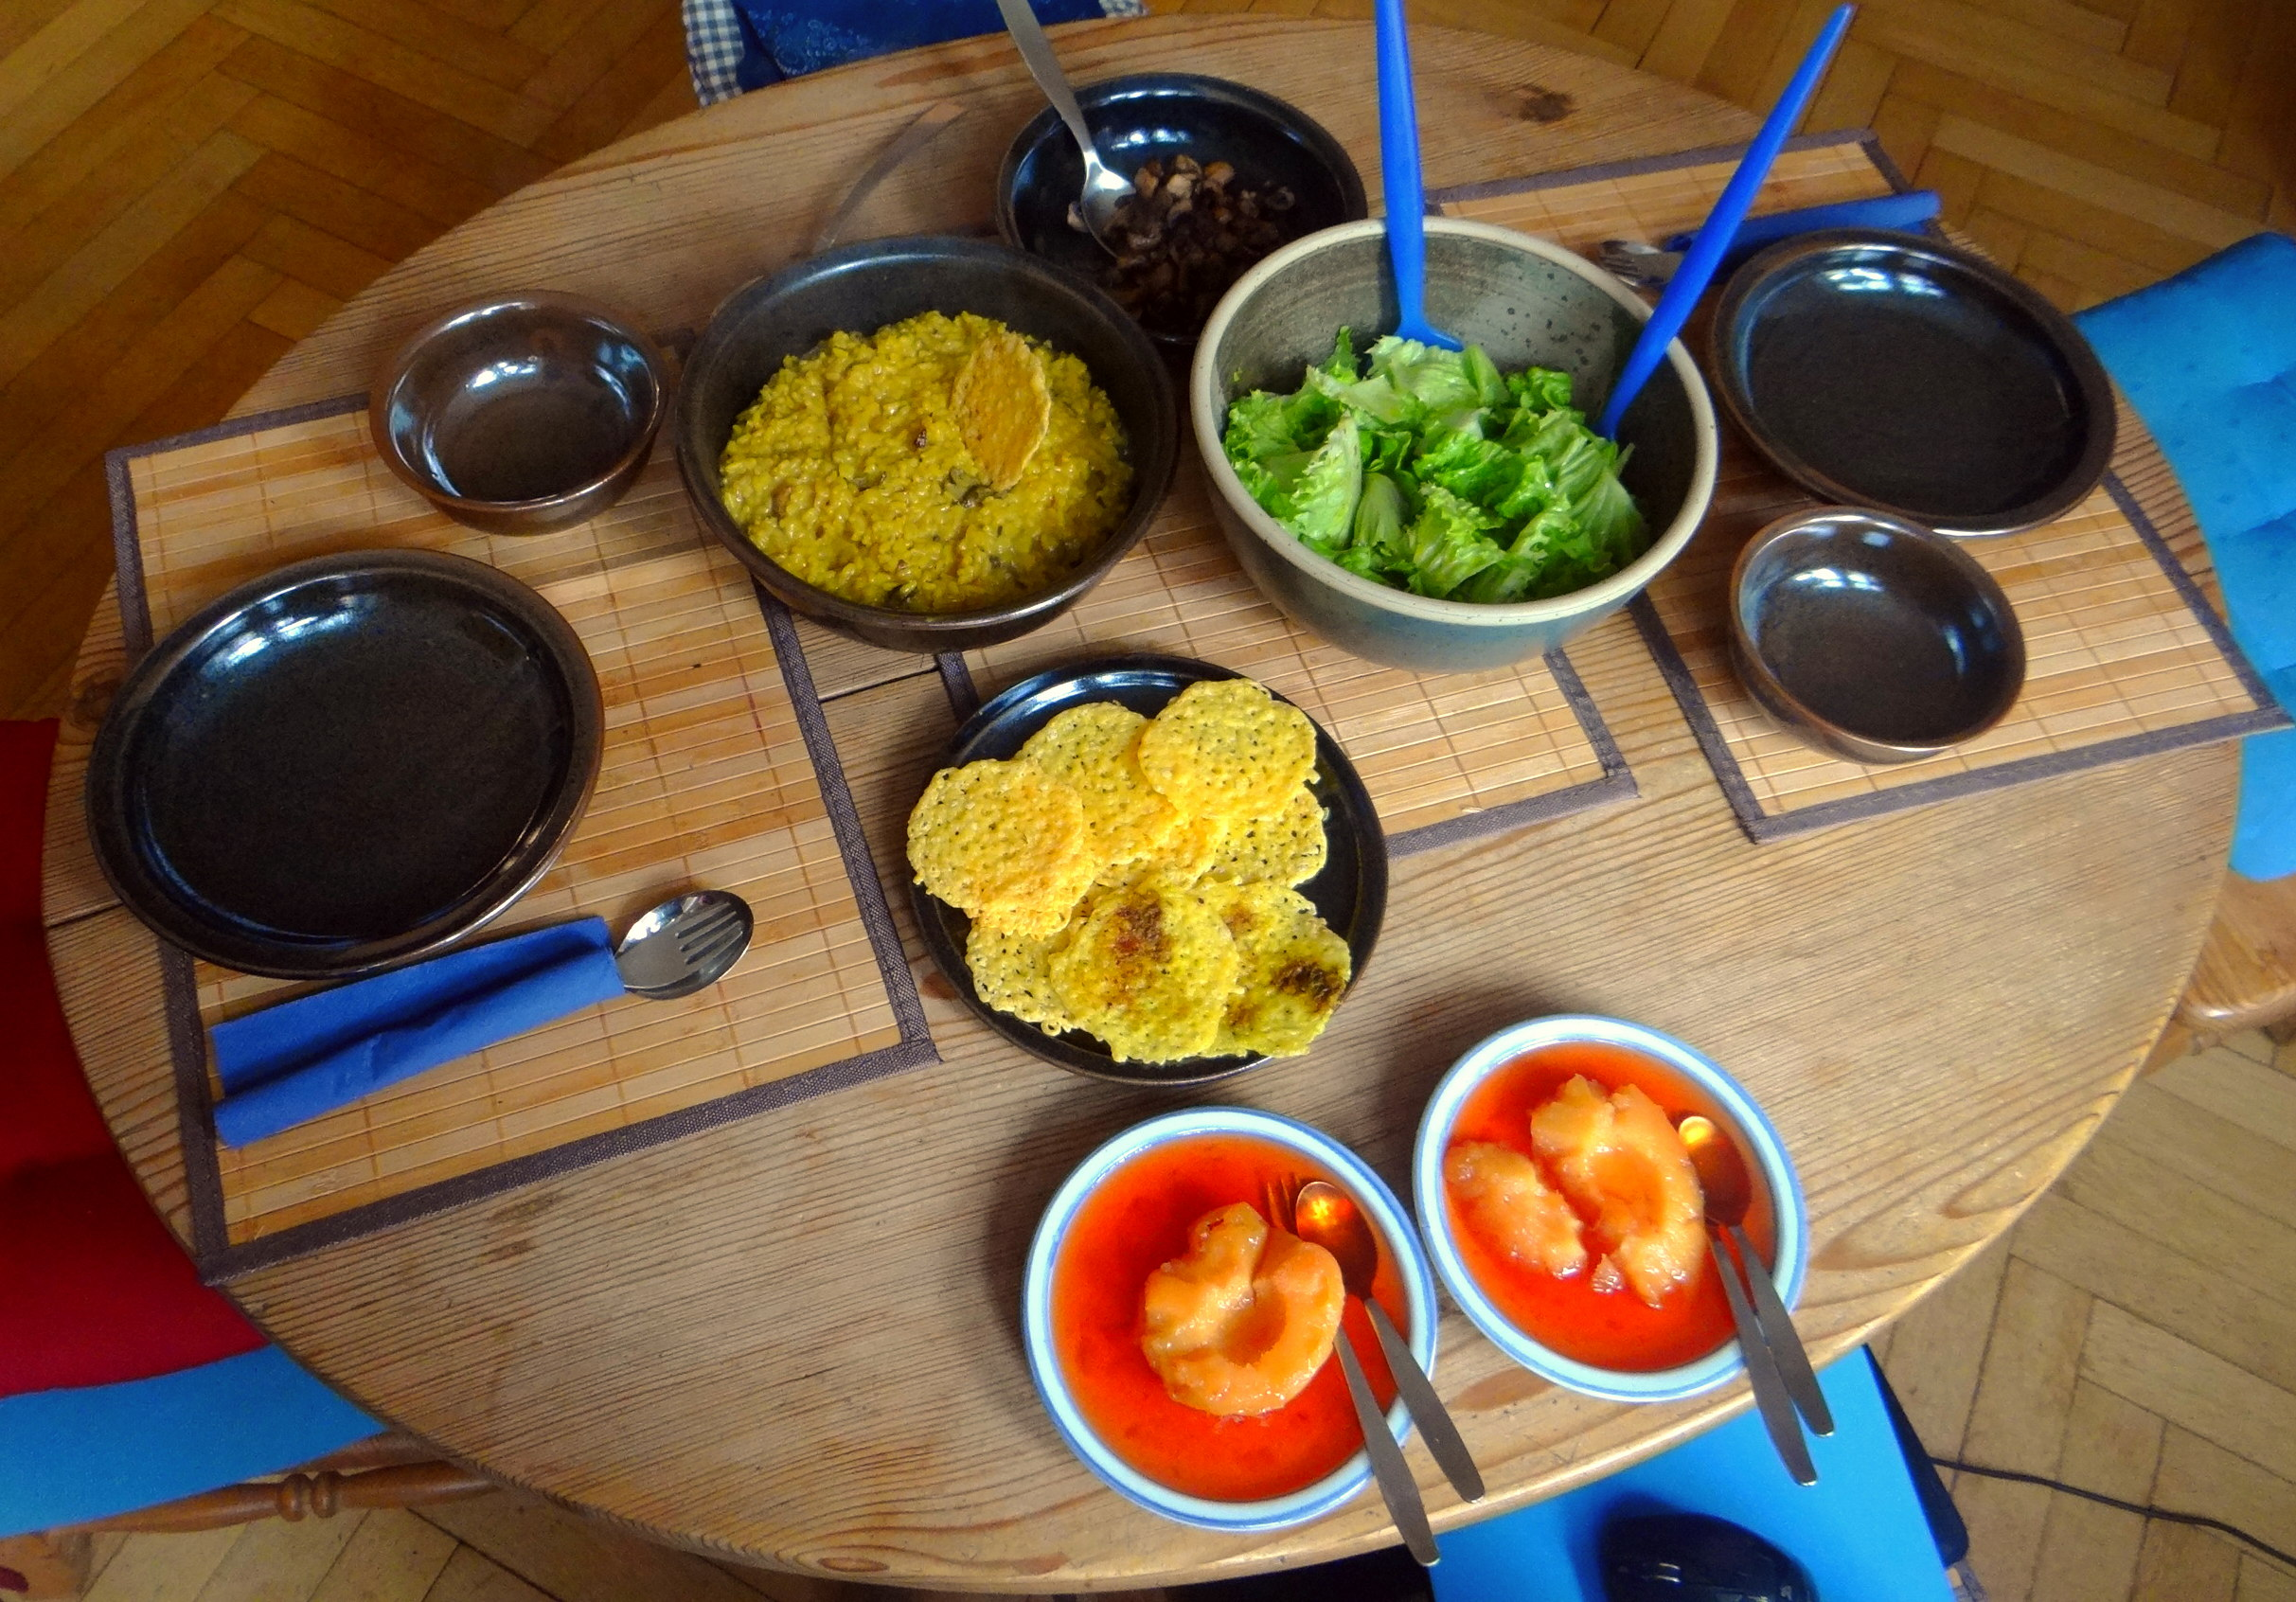 Austernpilz Risotto,Chamignon,Käse Cräcker,Salat,Quitten (6)